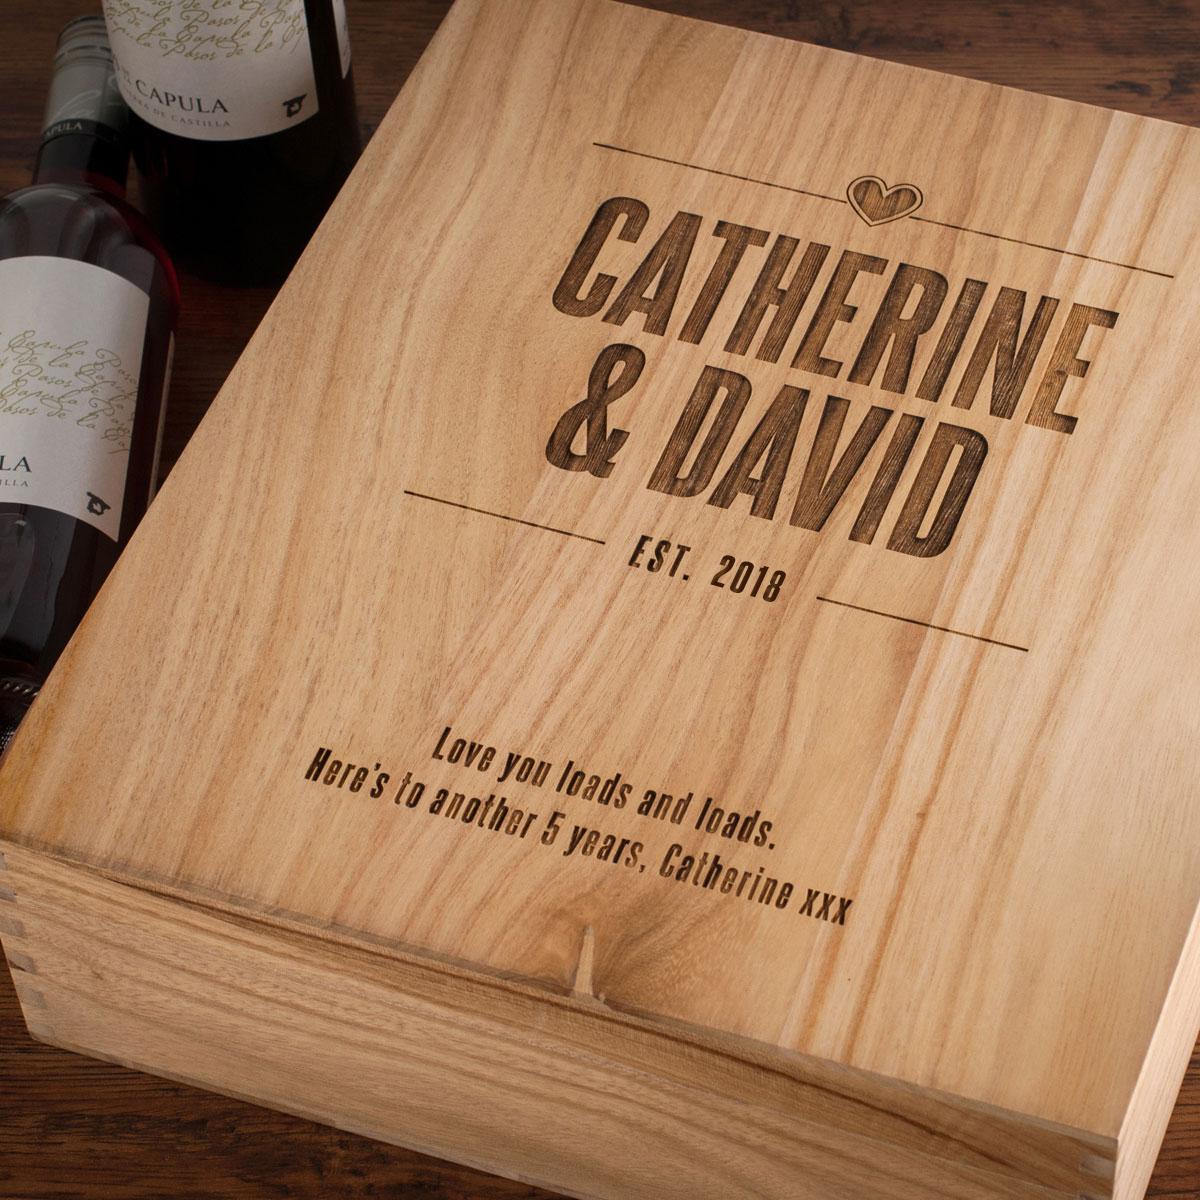 Personalised 3 Bottle Wooden Wine Box Established